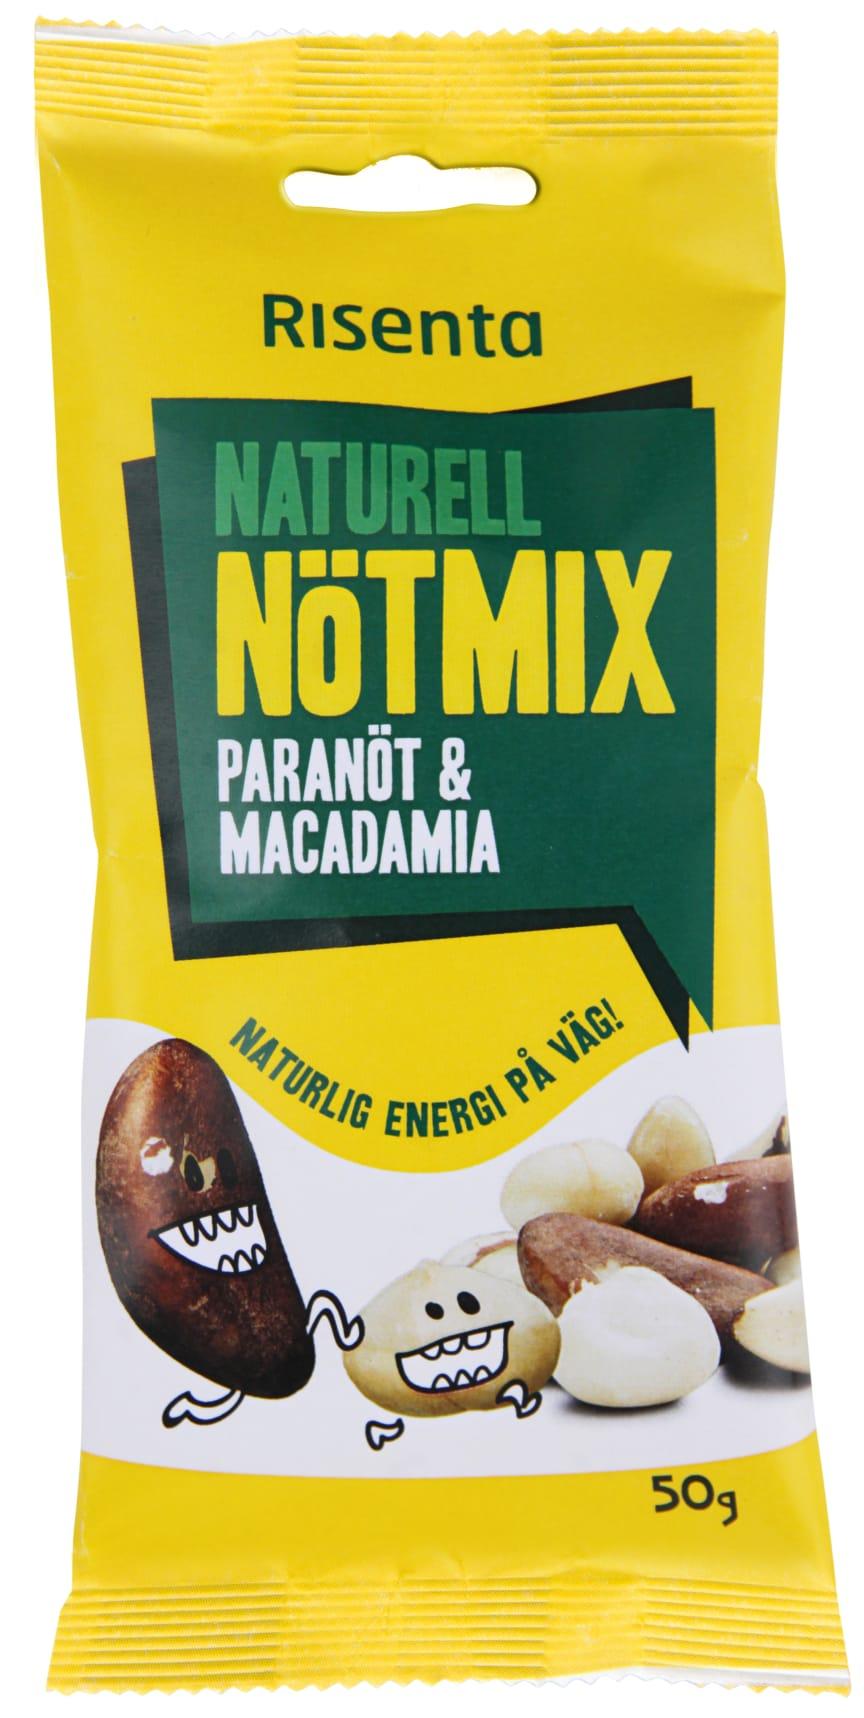 Naturell Nötmix paranöt och macadamia